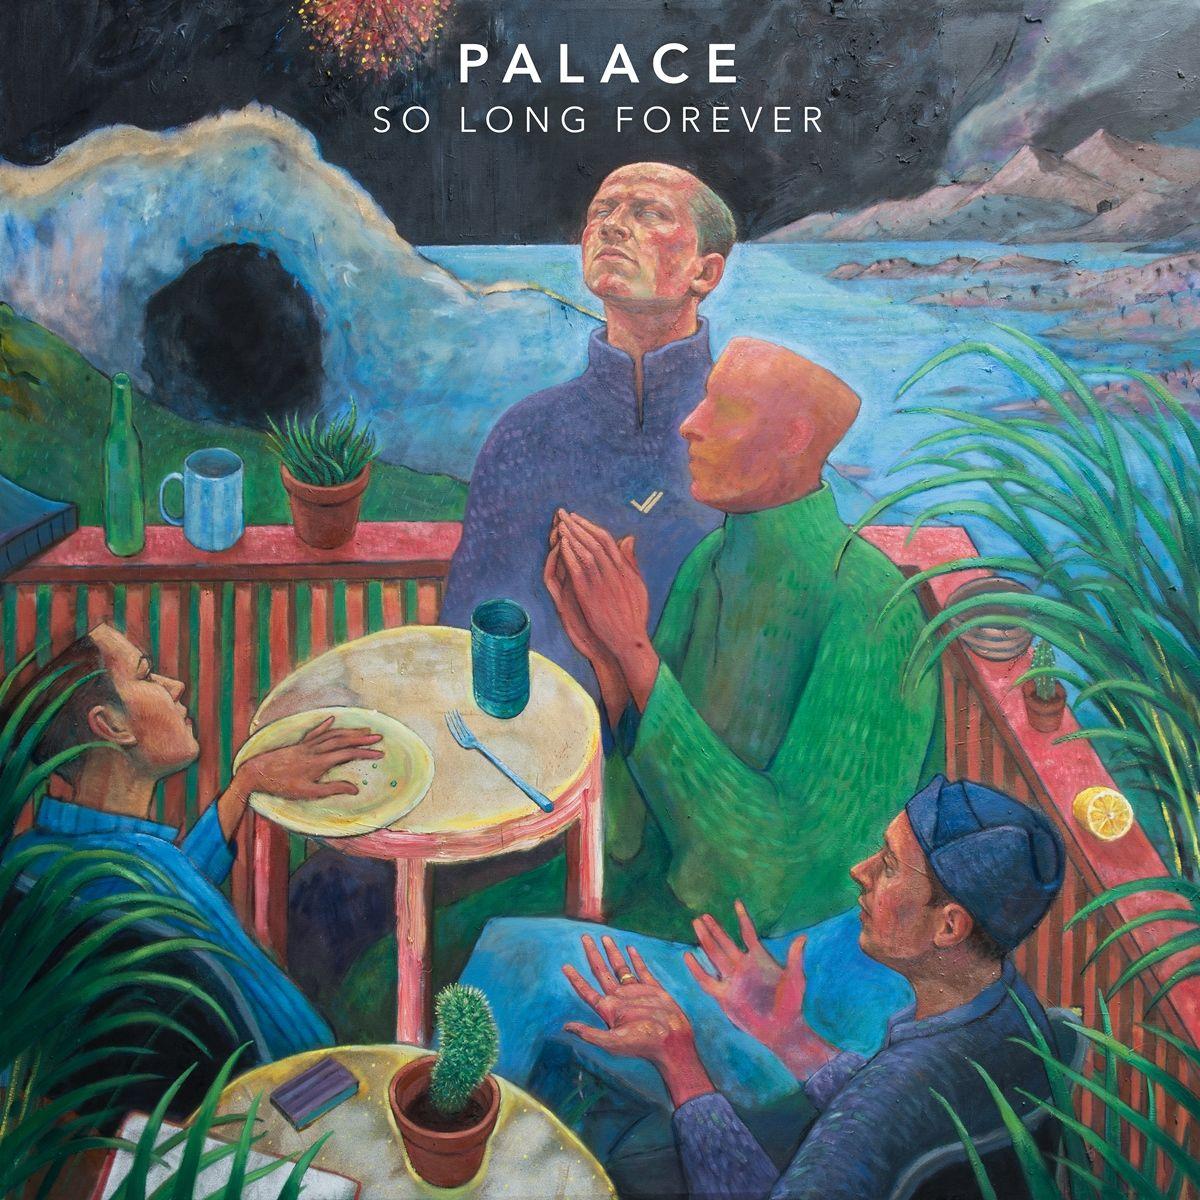 palace-so-long-forever-artwork